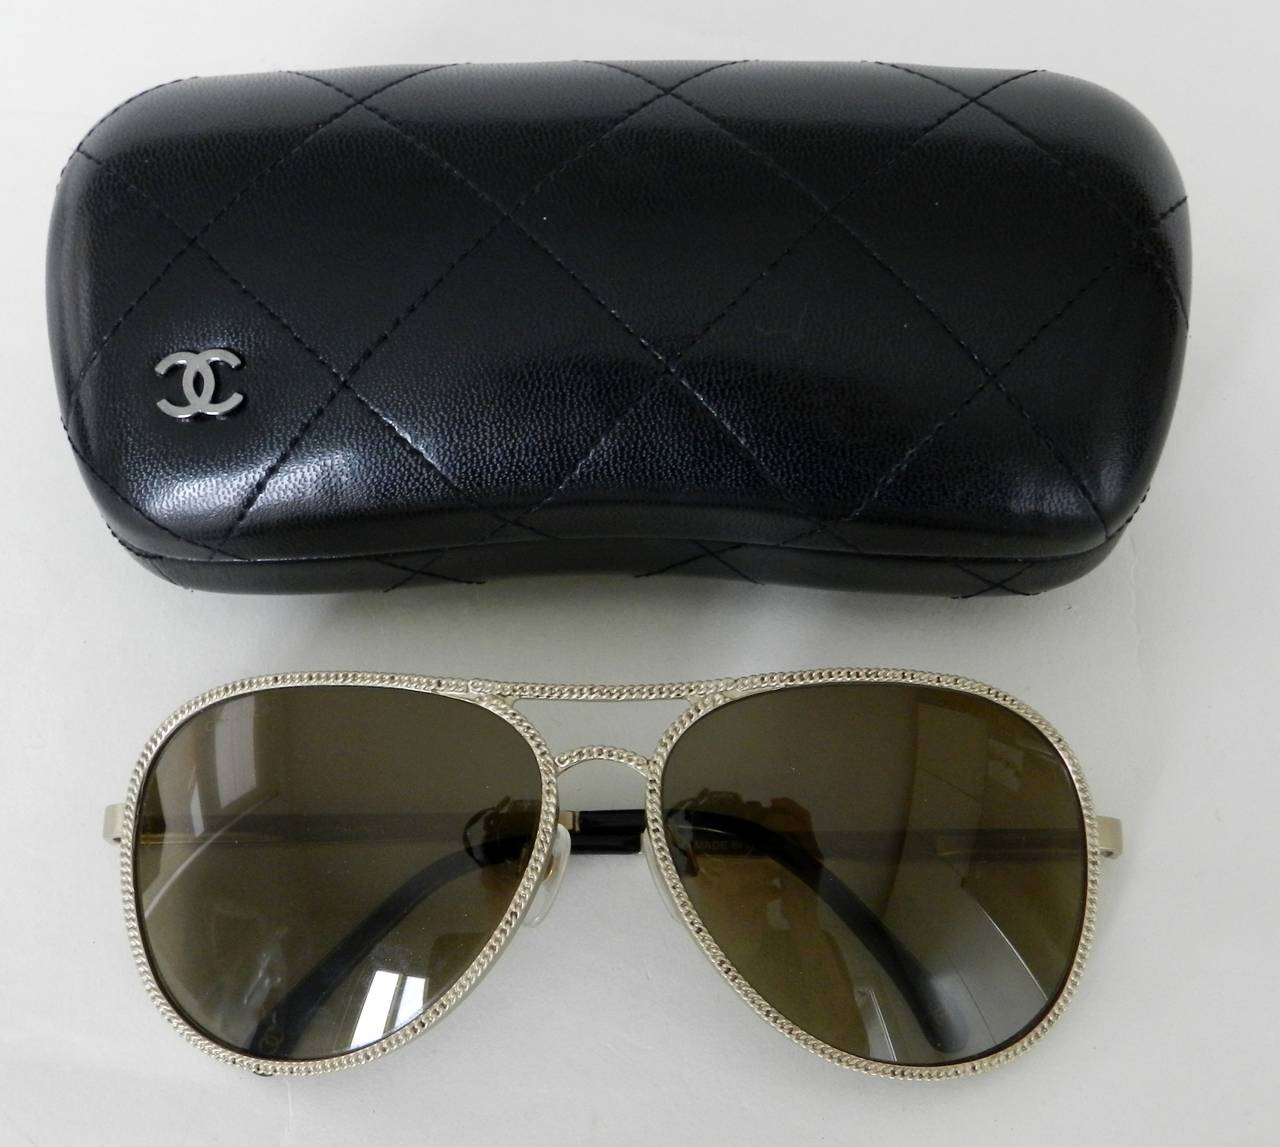 069167643d Chanel 11C Gold Aviator Sunglasses at 1stdibs